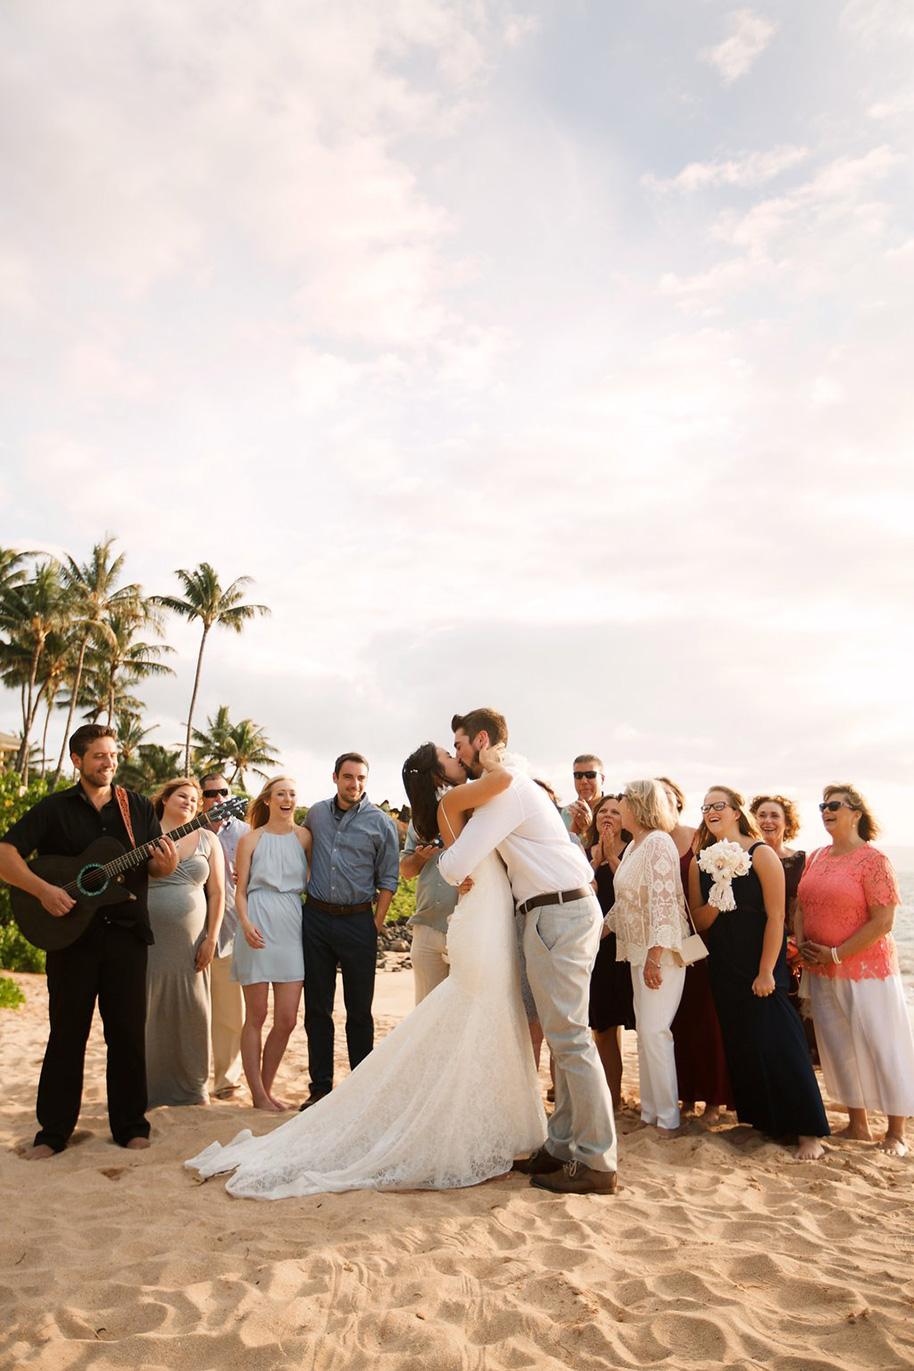 Maui-Beach-Wedding-070616-14